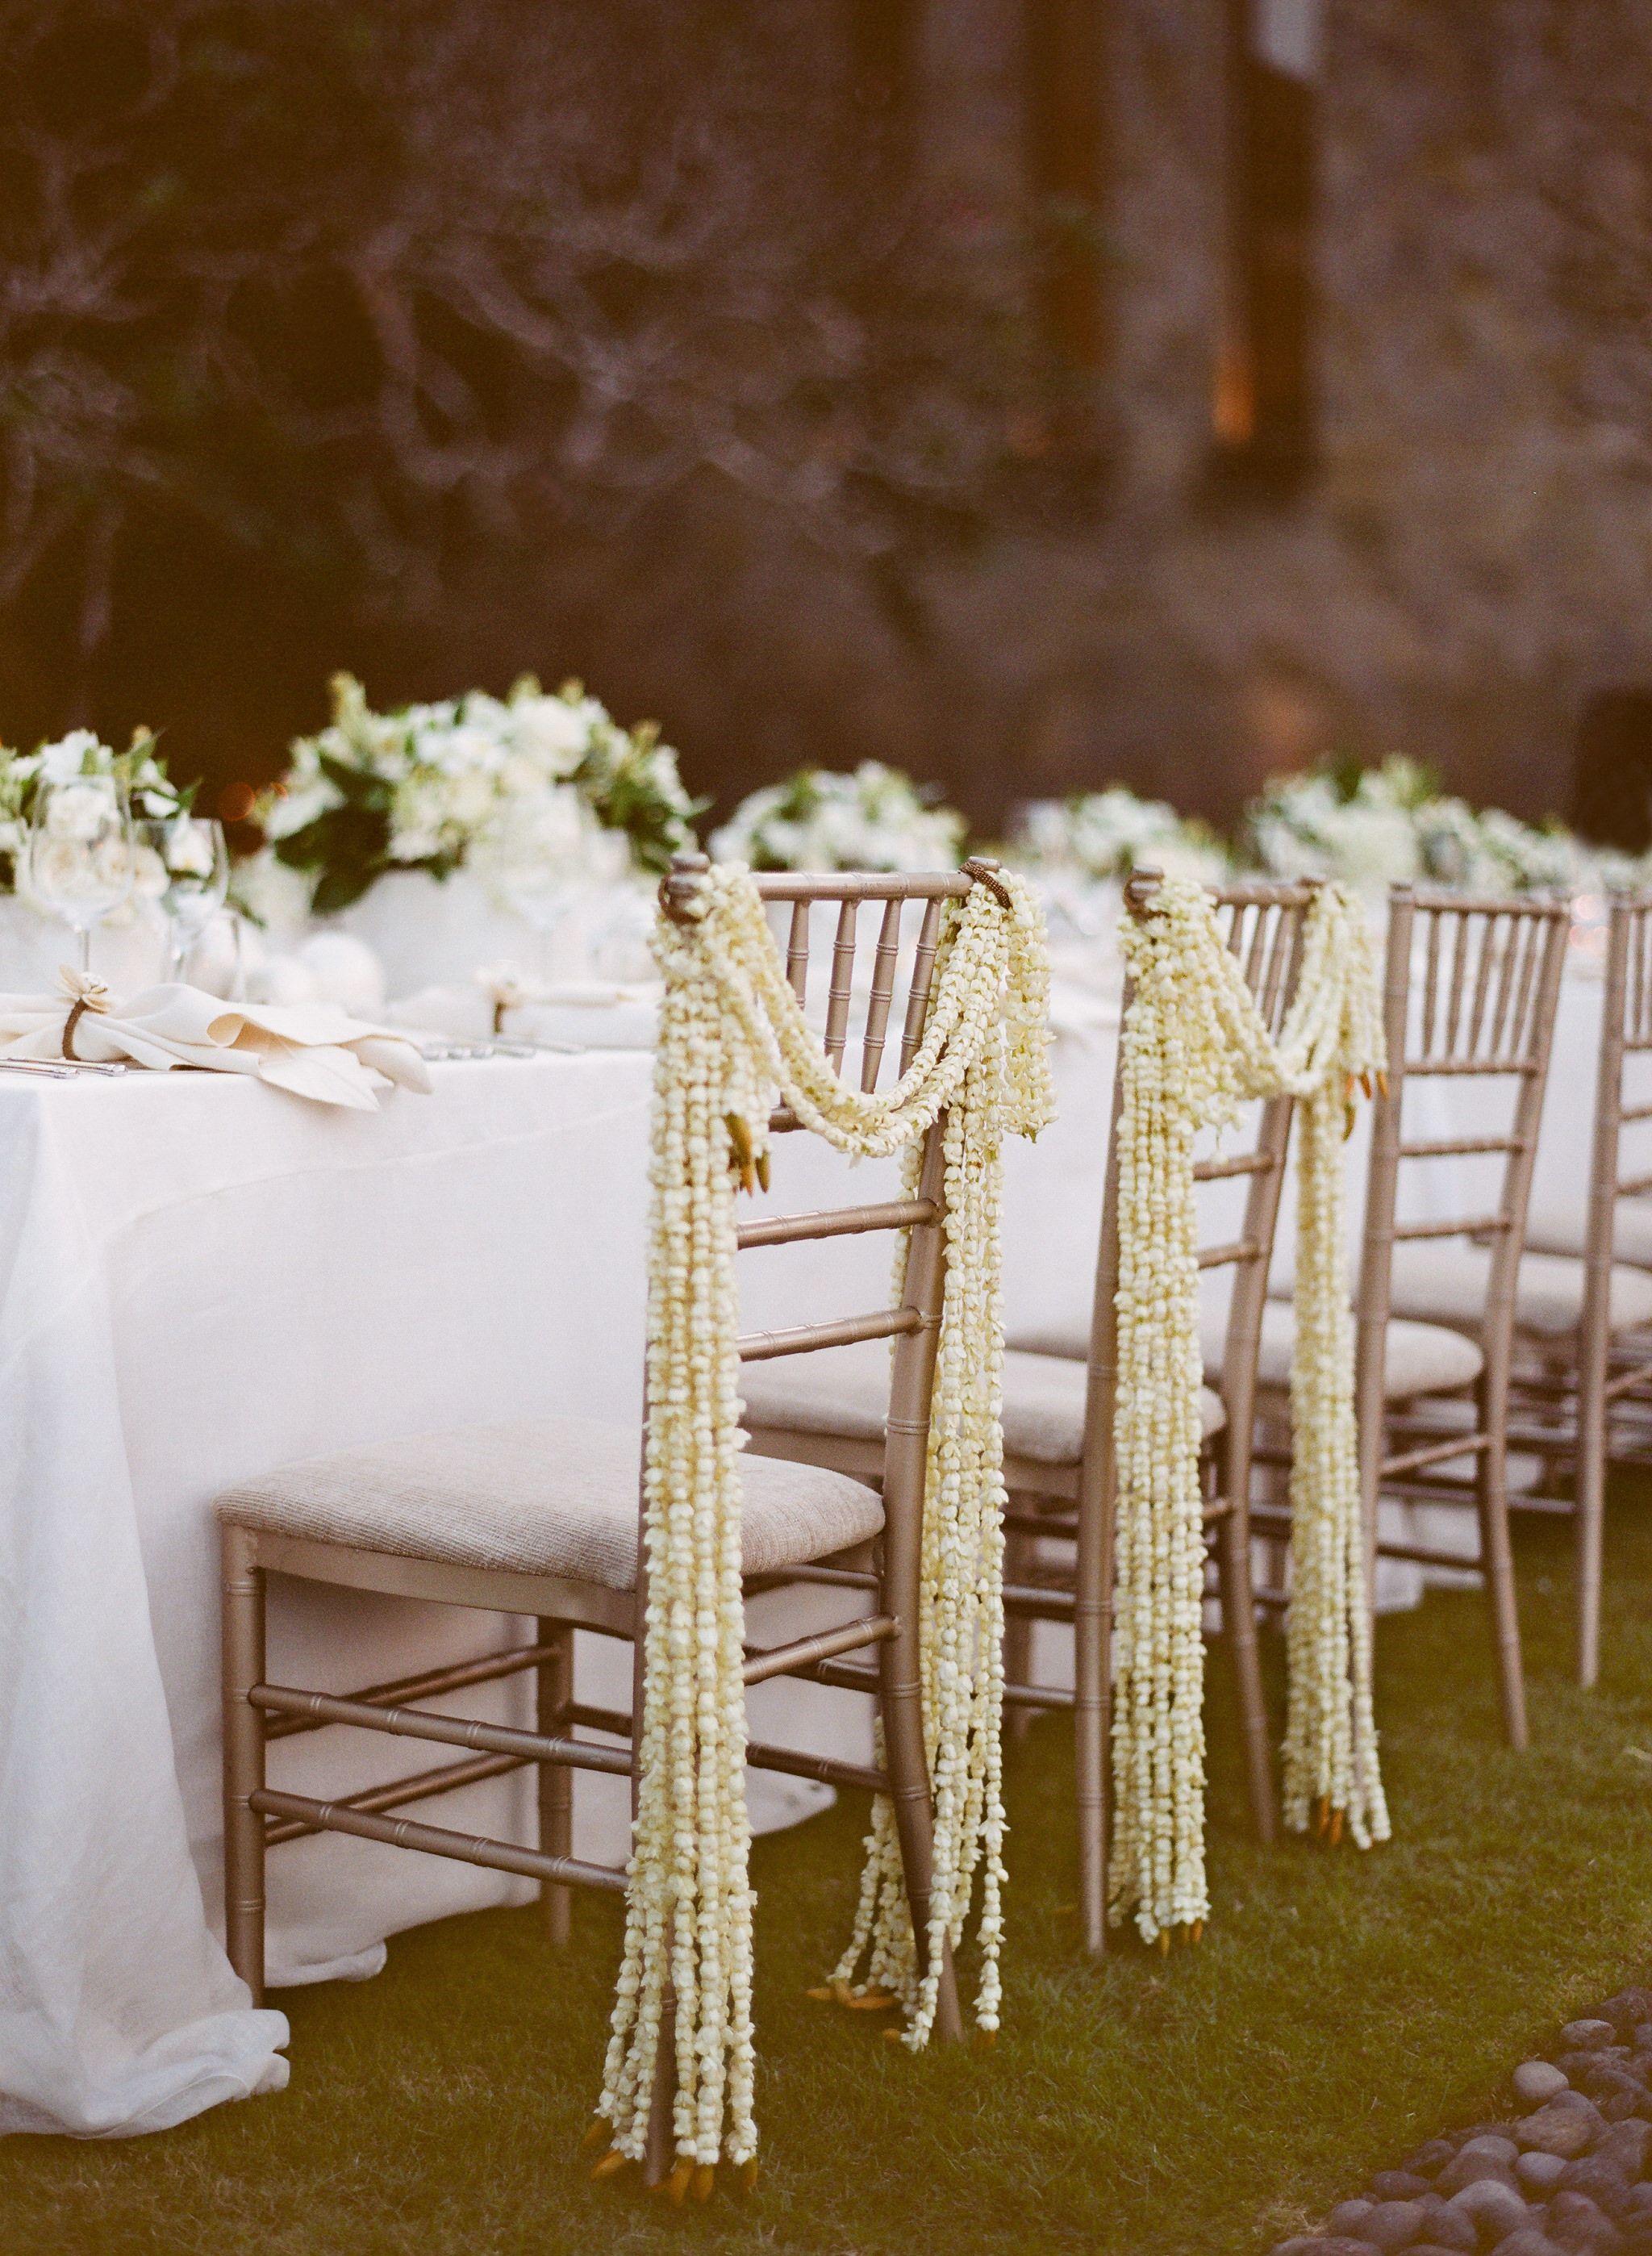 Wedding Chair Covers Hawaii Sale Style Garlands Pinterest Lisa Rice